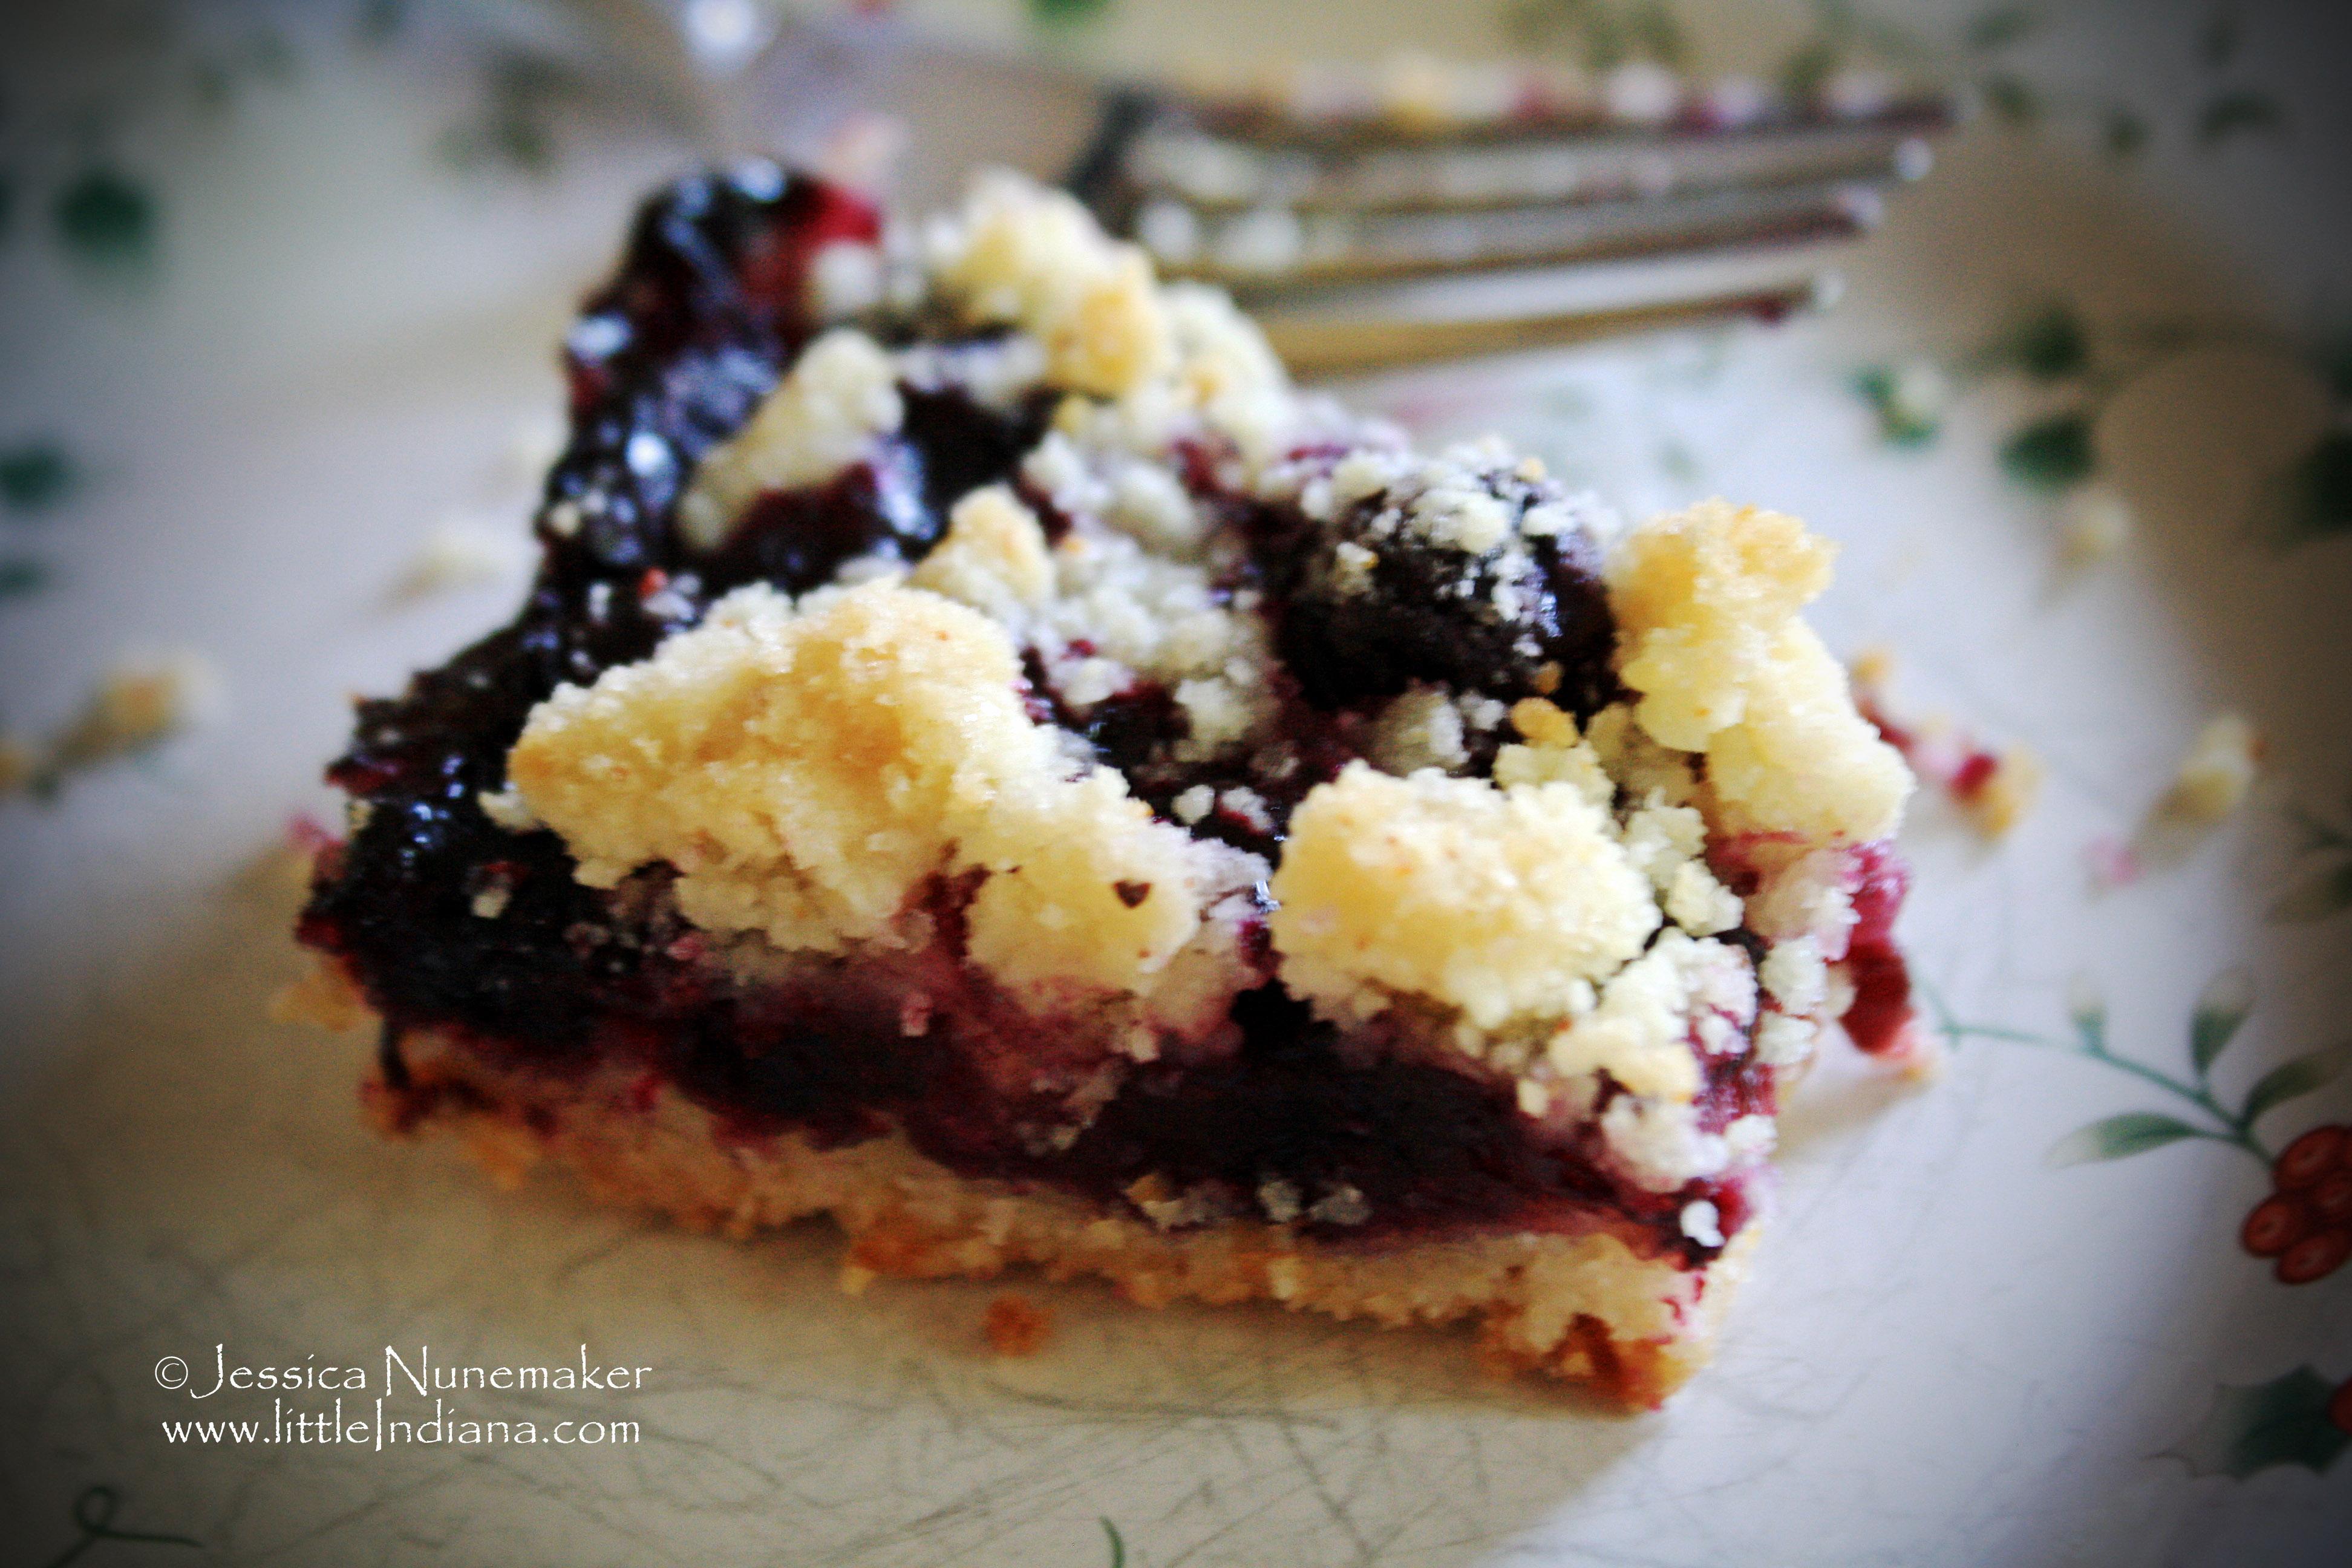 Blueberry Desserts Easy  blueberry dessert